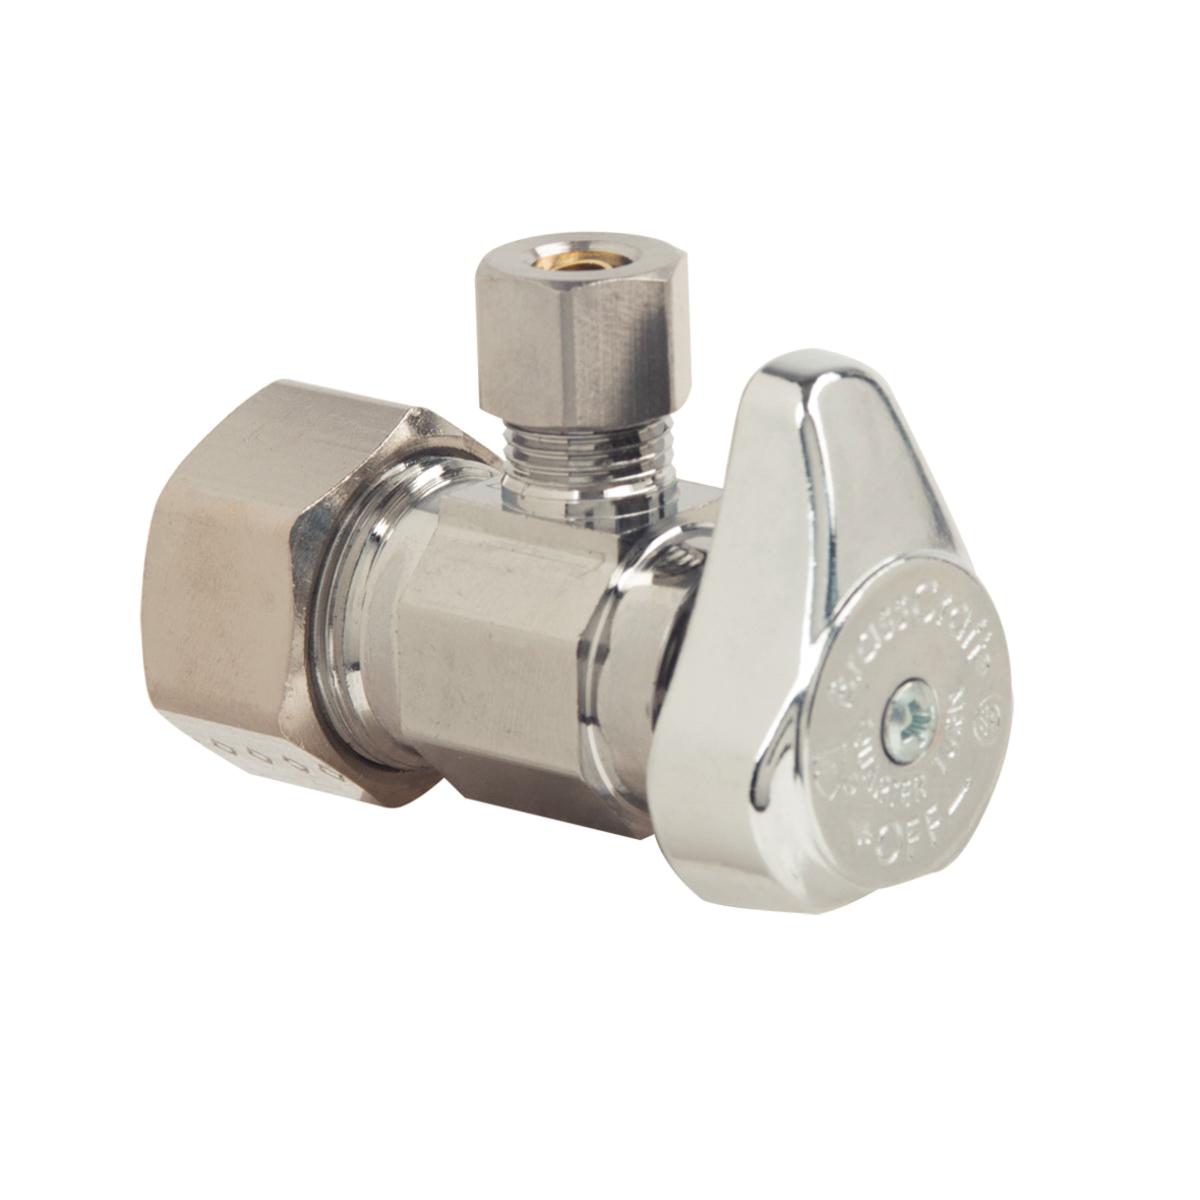 BrassCraft® G2CR09XC Brass Angle Supply Stop Valve, 1/2 in x 1/4 in, Compression, 125 psi, 40 - 140 deg F